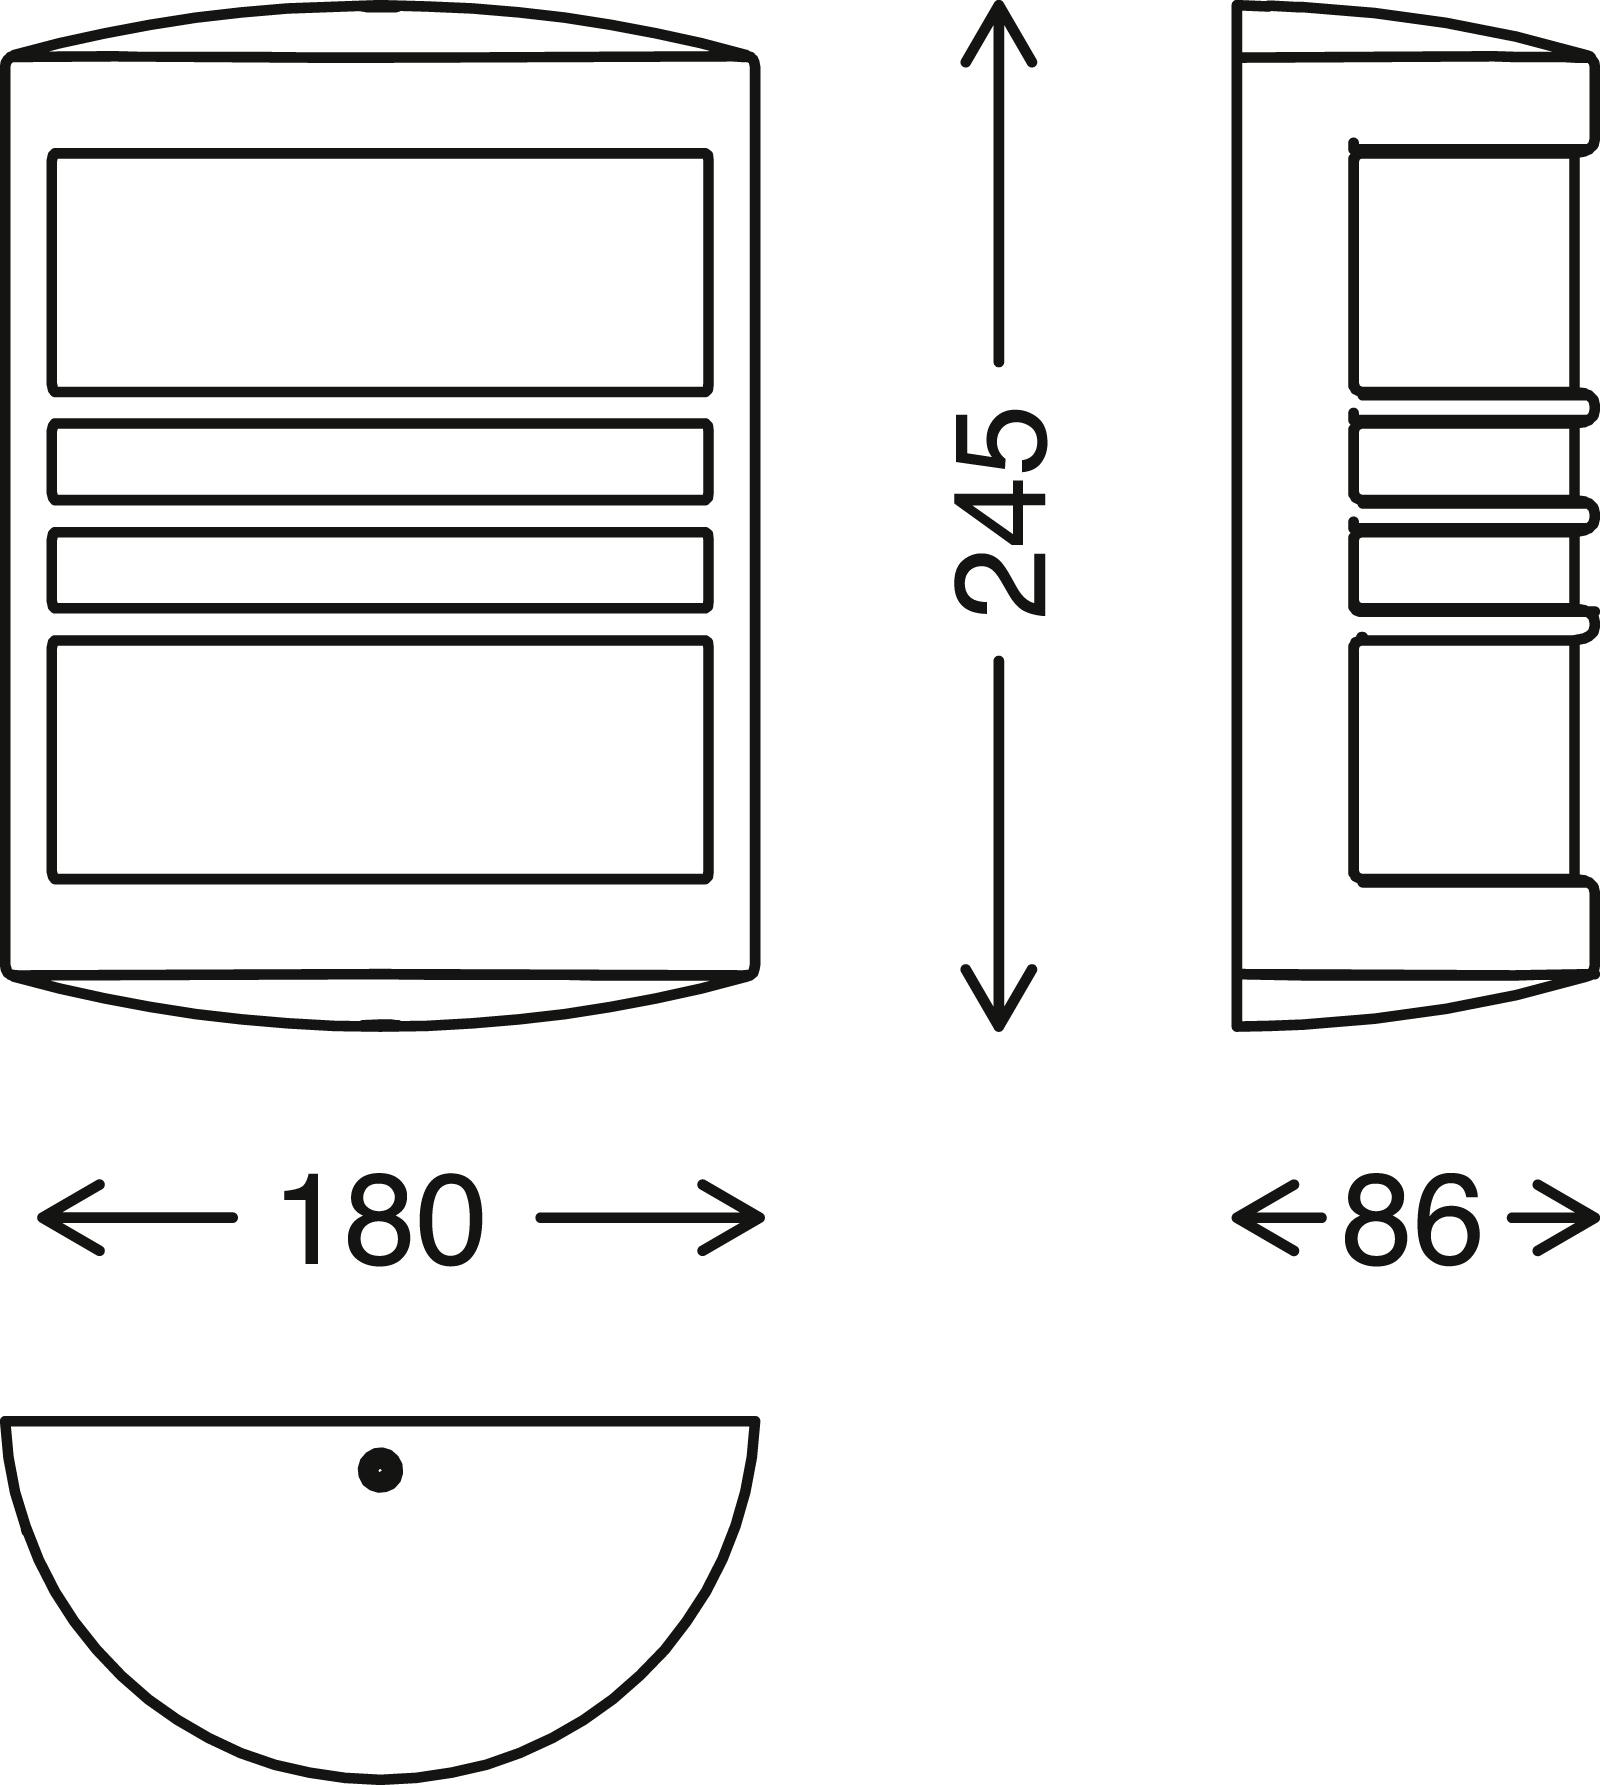 TELEFUNKEN LED Aussenwandleuchte, 18 cm, 12 W, Schwarz